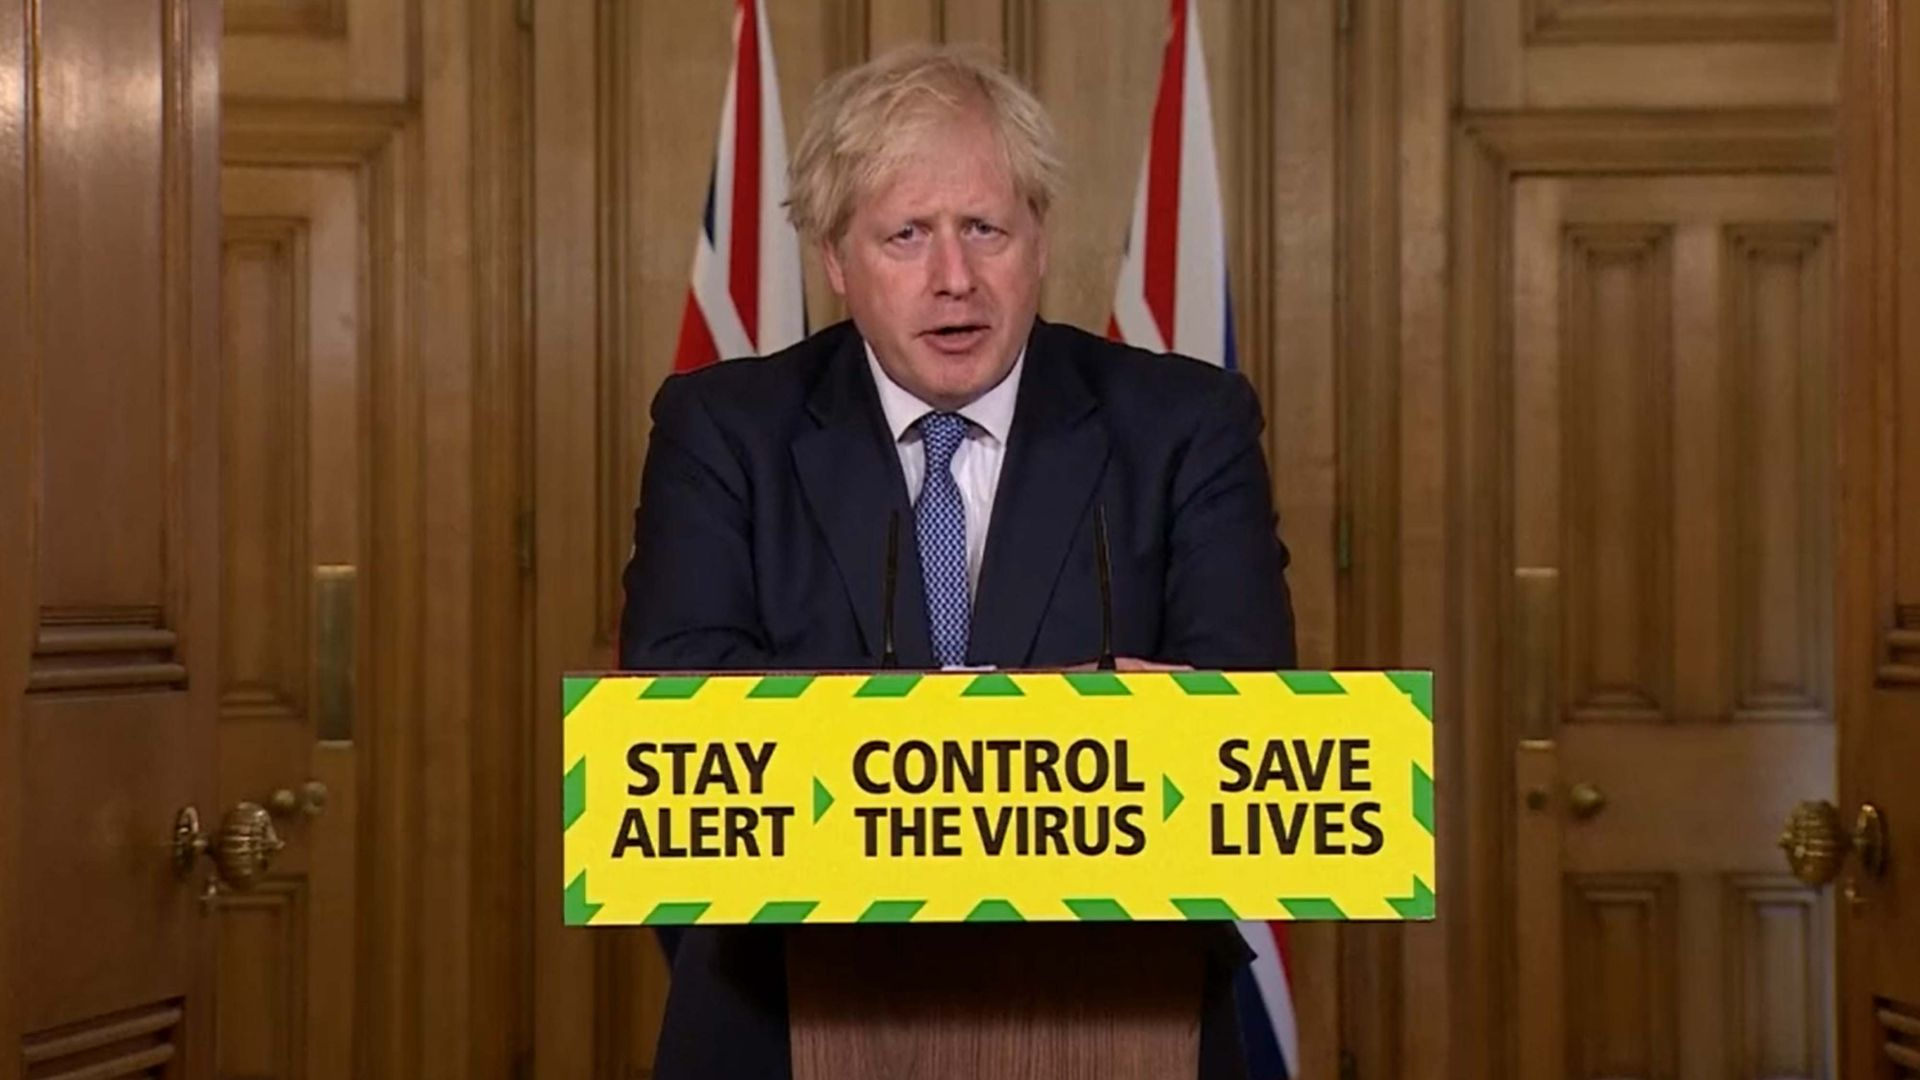 Prime minister Boris Johnson during a media briefing on coronavirus - Credit: PA